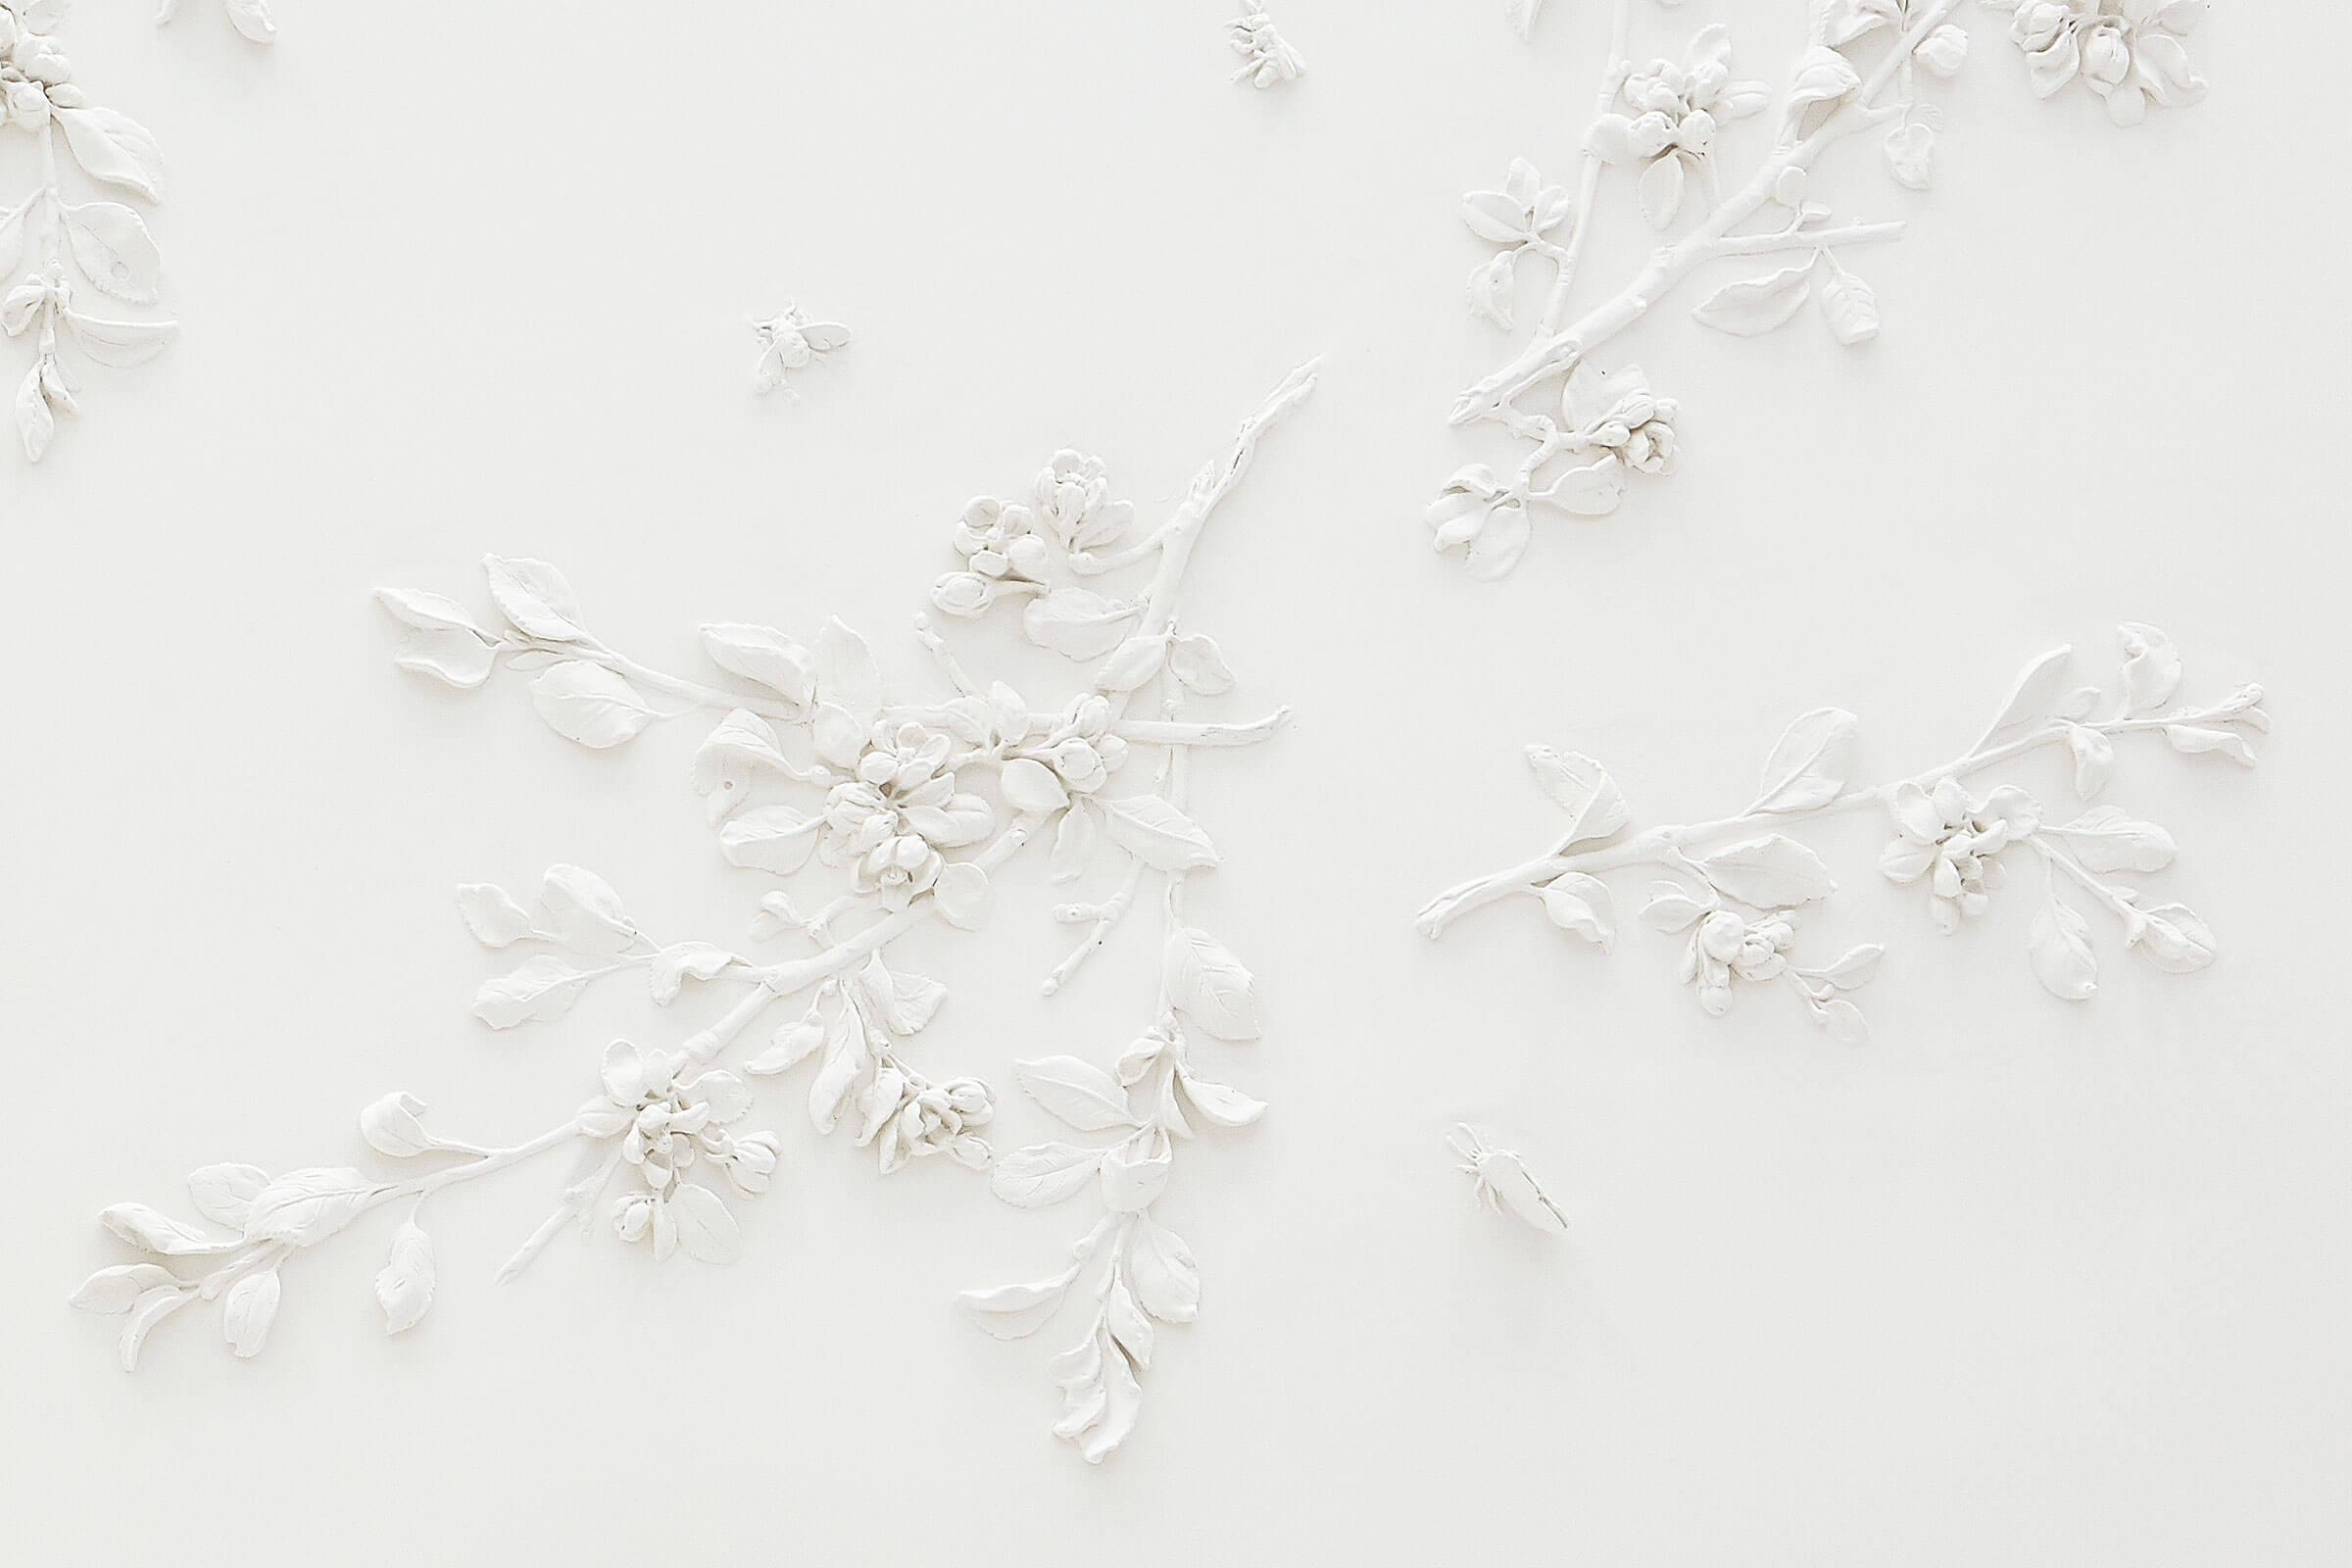 stukloft claus lind © stuk moddelering stukkatur moderne interiør